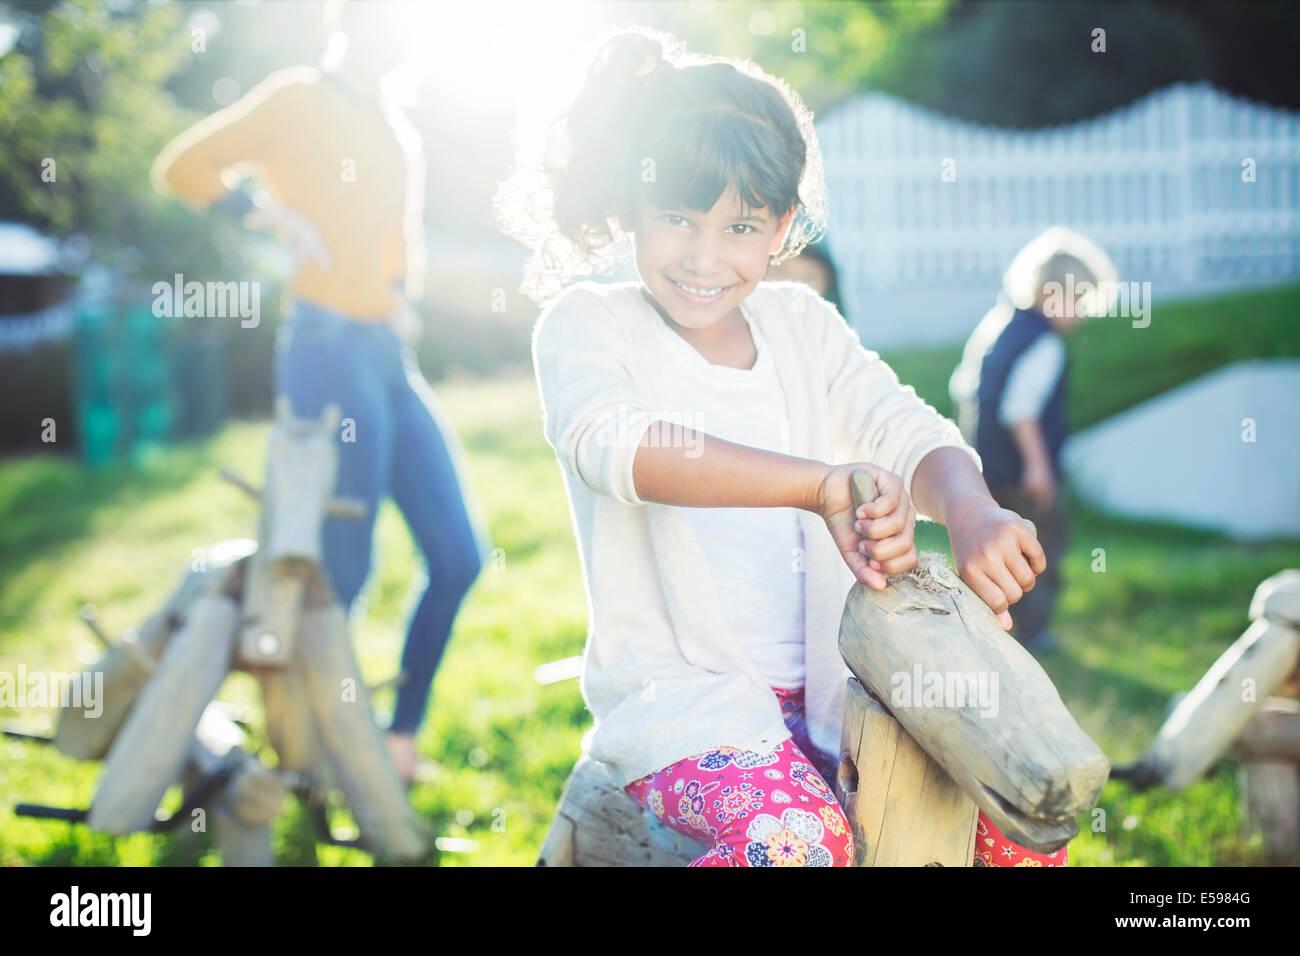 Chica sonriente en Rocking Horse en playground Imagen De Stock